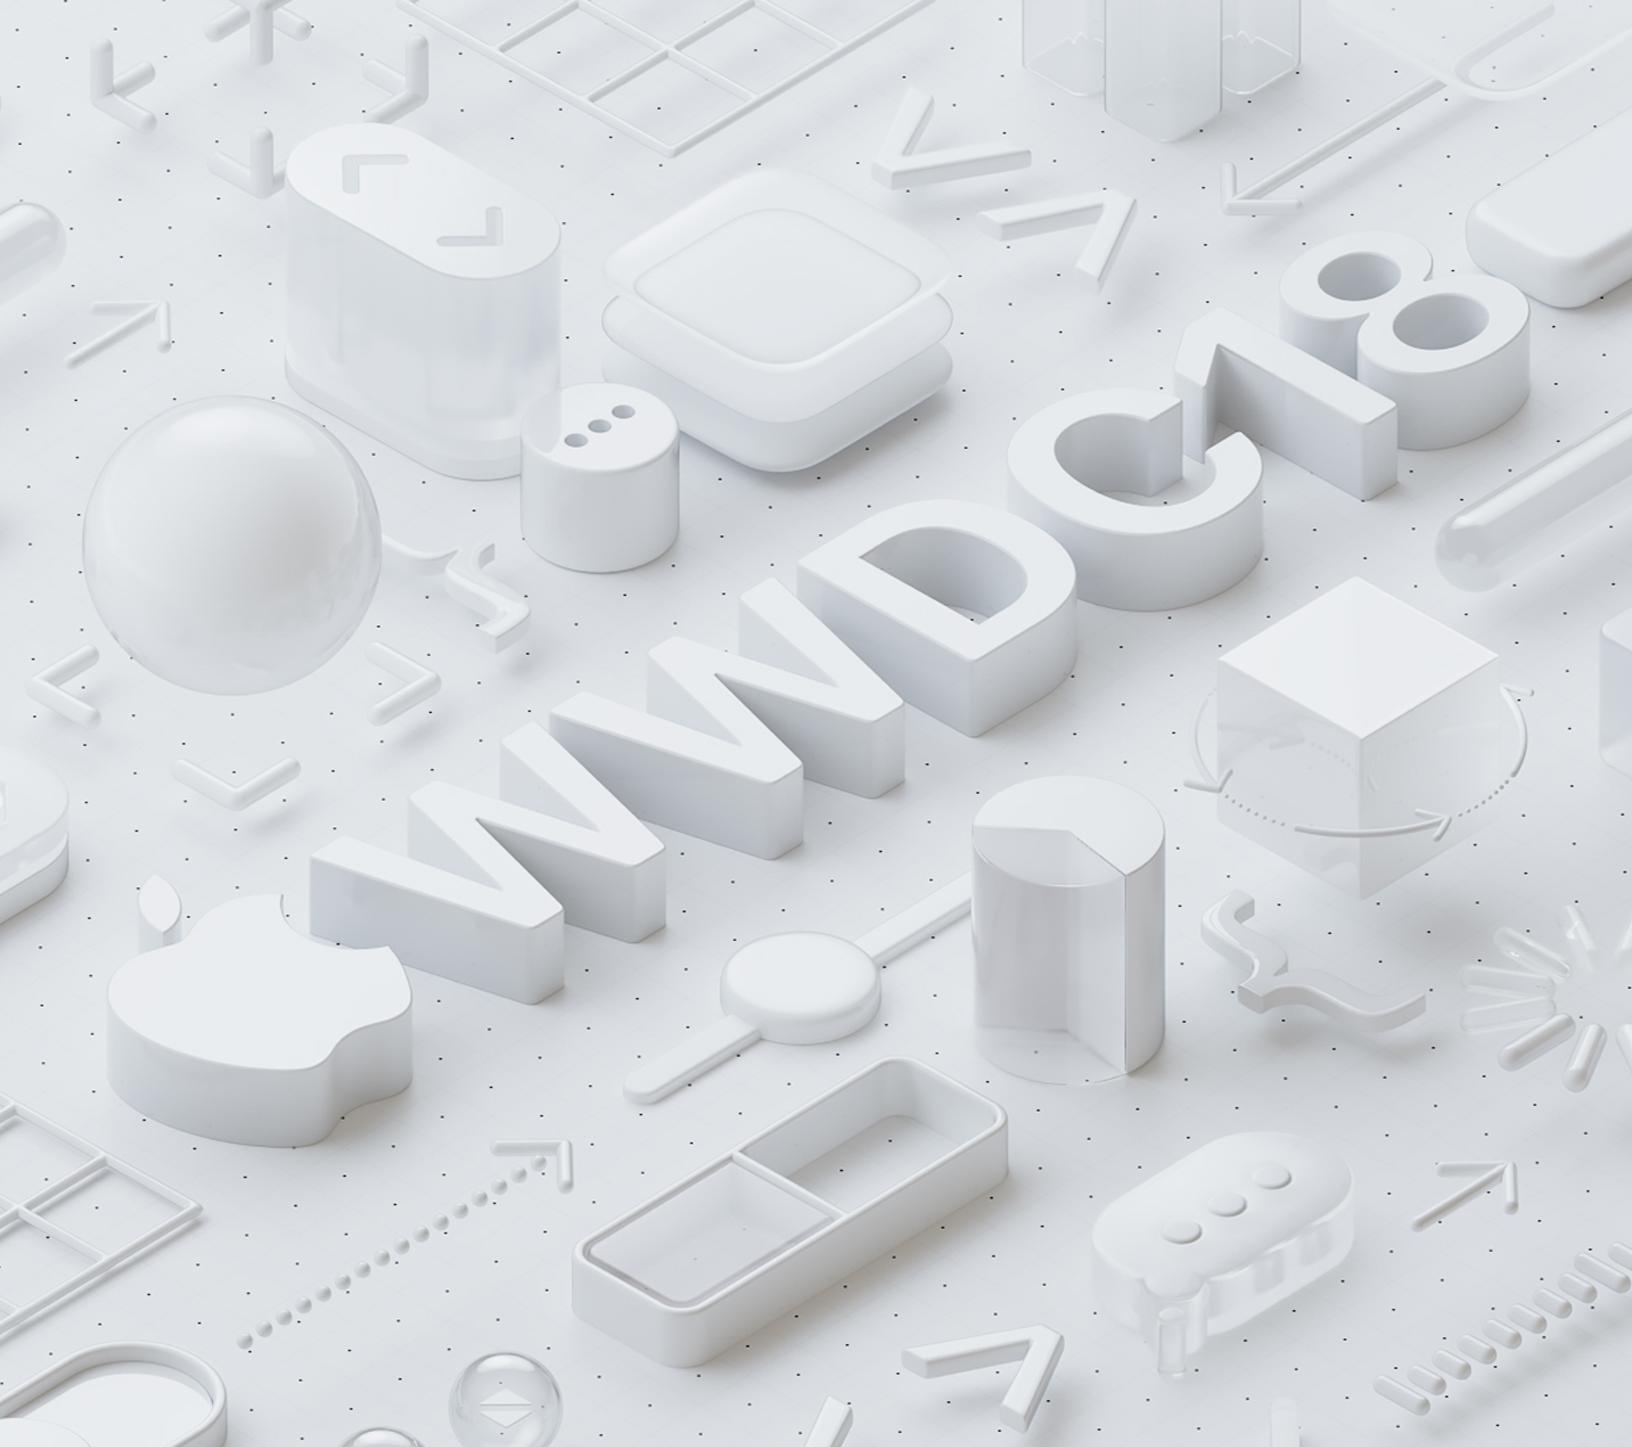 WWDC-2018-San Jose-Apple